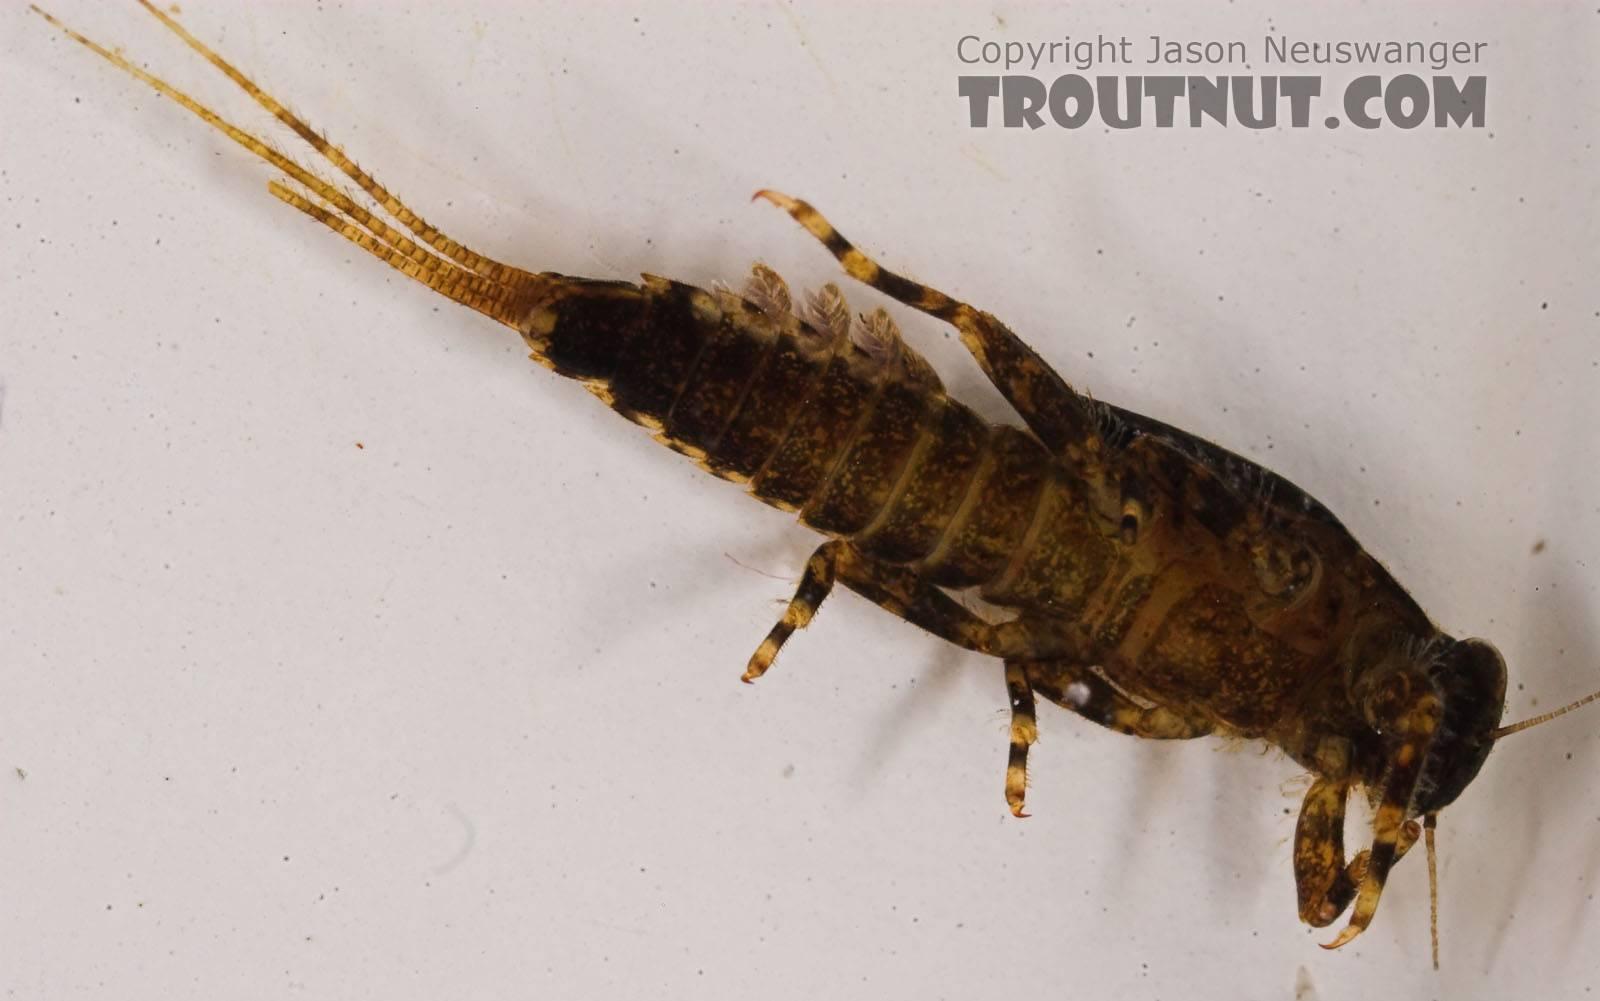 Ephemerella (Hendricksons, Sulphurs, PMDs) Mayfly Nymph from Eighteenmile Creek in Wisconsin